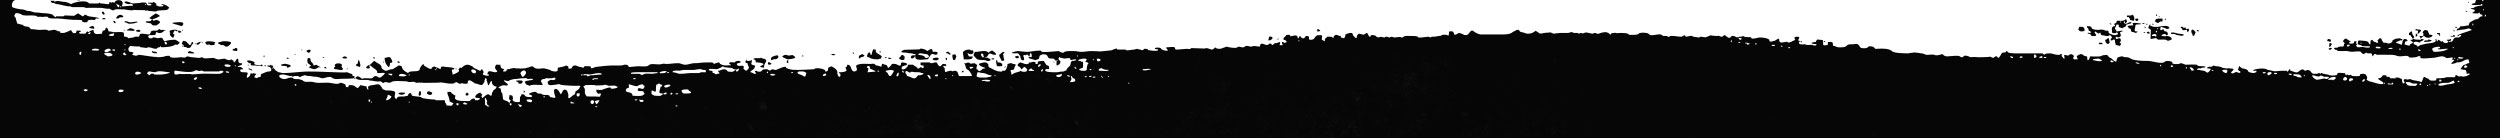 bg-texture-half-triatlon-negra